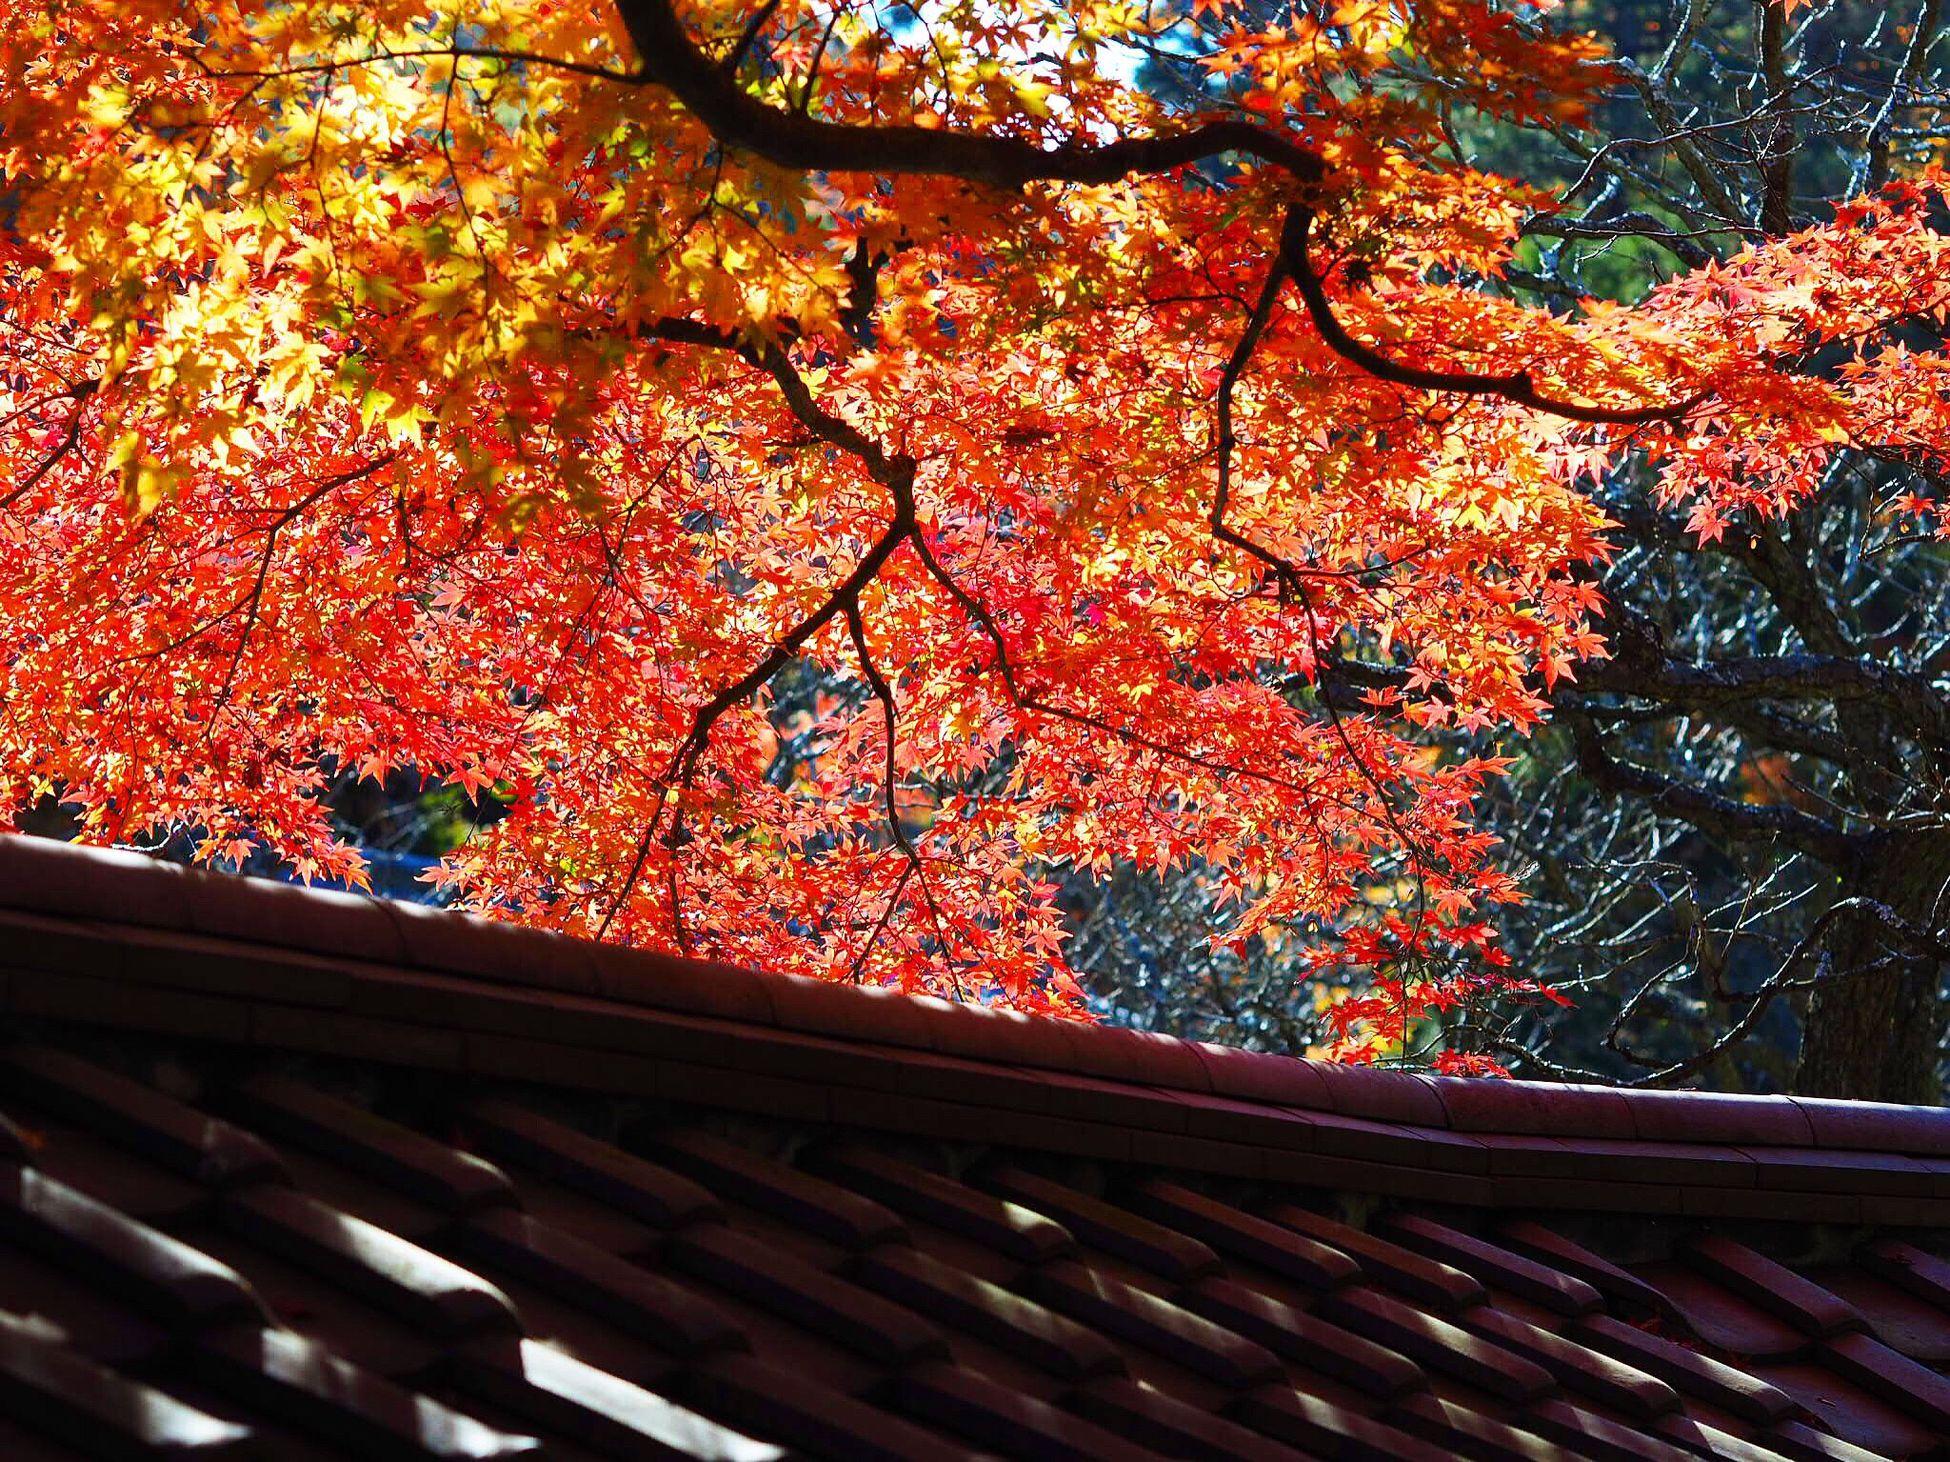 Red Tree Autumn Nature Beauty In Nature Leaf Outdoors Day Welcomeweekly Olympus Om-d E-m10 Japanese Garden Autumn Momiji Colored Leaves Kamakura Kitakamakura Kamakura Japan Good Morning Blue Sky Tokeiji Tokei Temple Tree 東慶寺